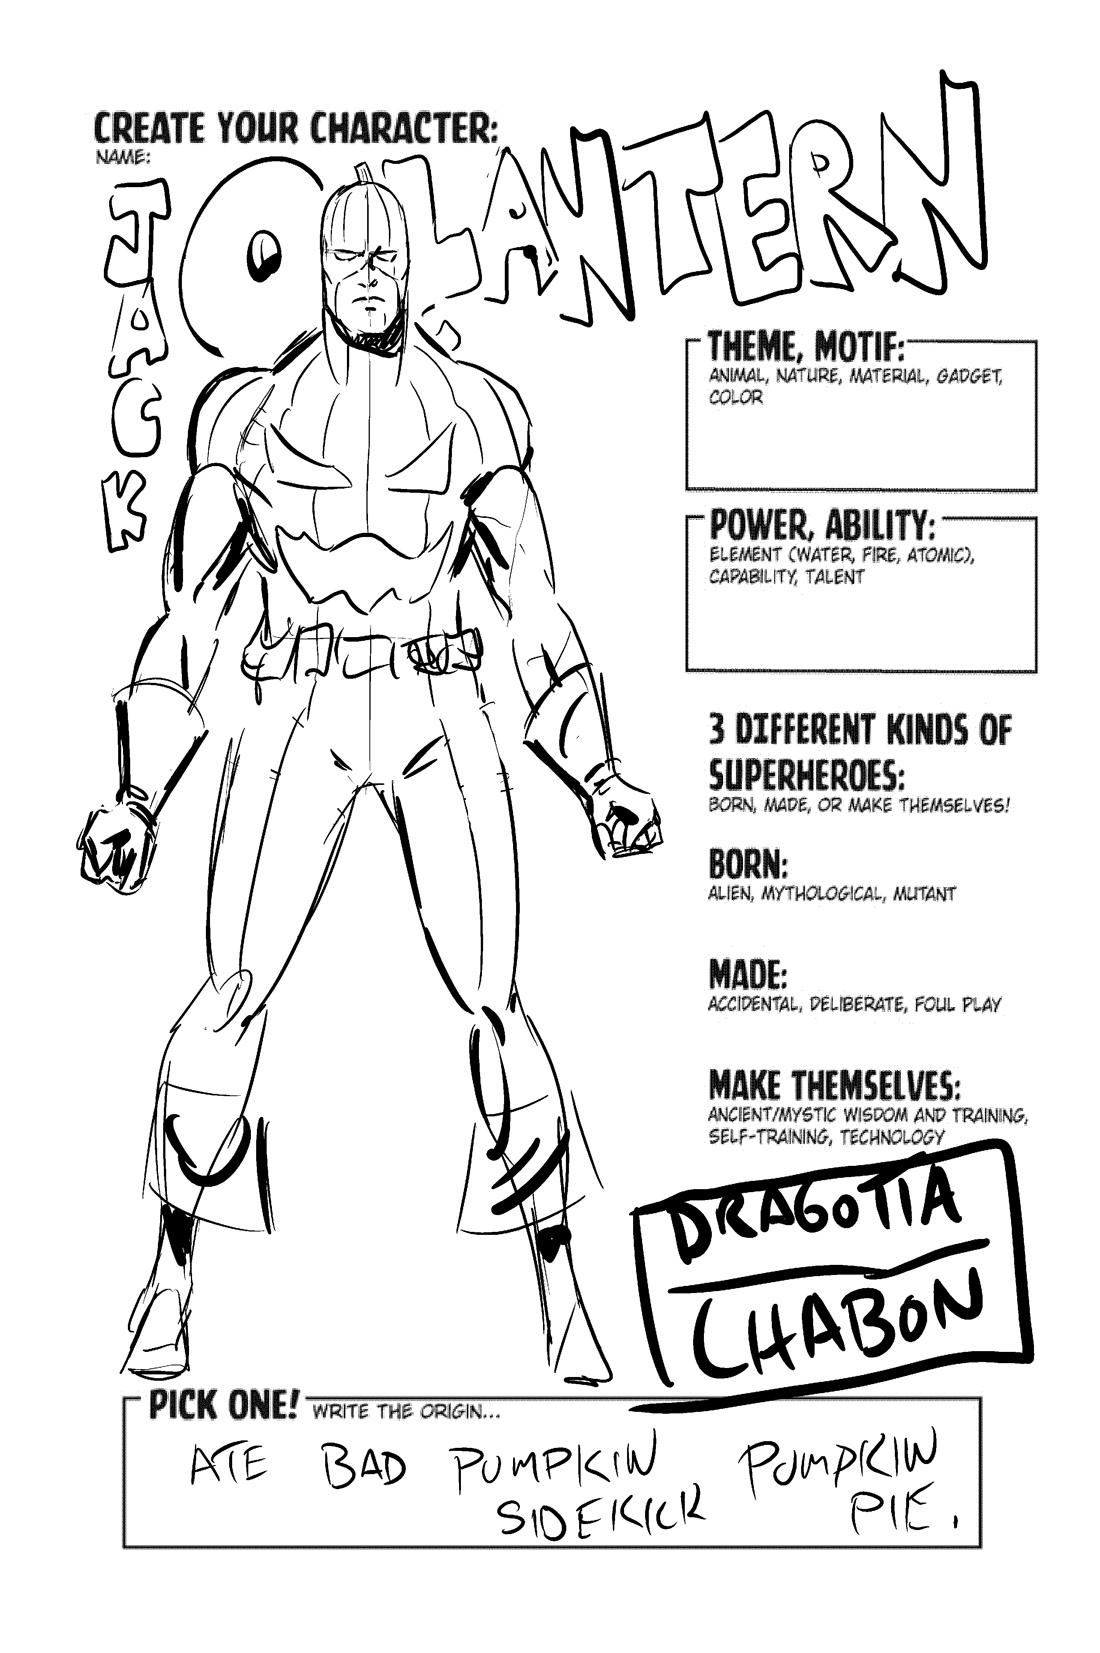 15 Best Images Of Design Your Own Superhero Worksheet